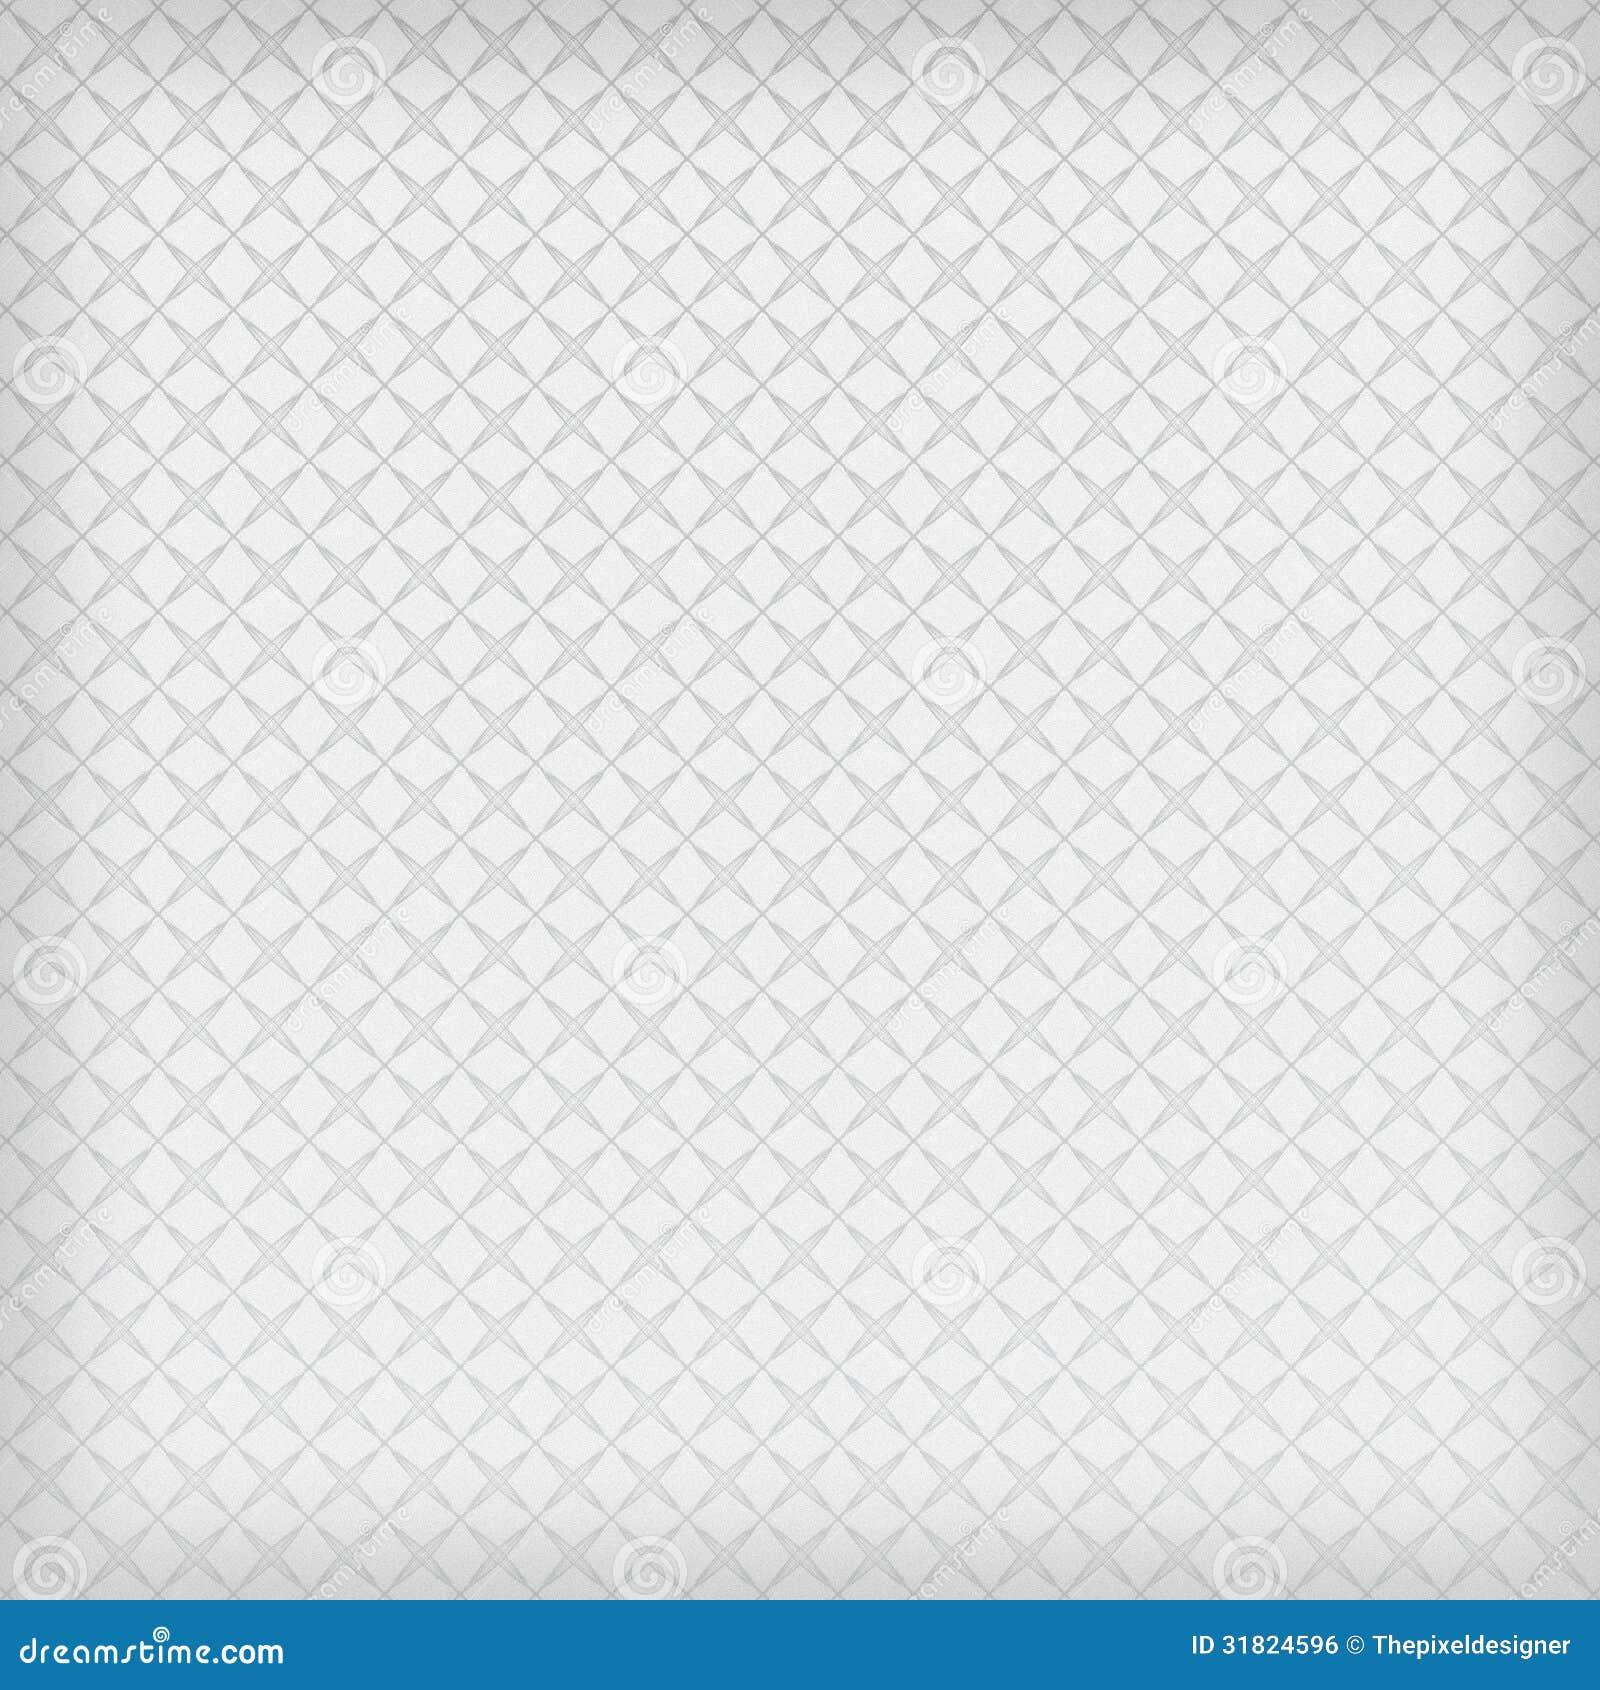 Silver design wallpaper 2017 grasscloth wallpaper for Grey and white wallpaper designs